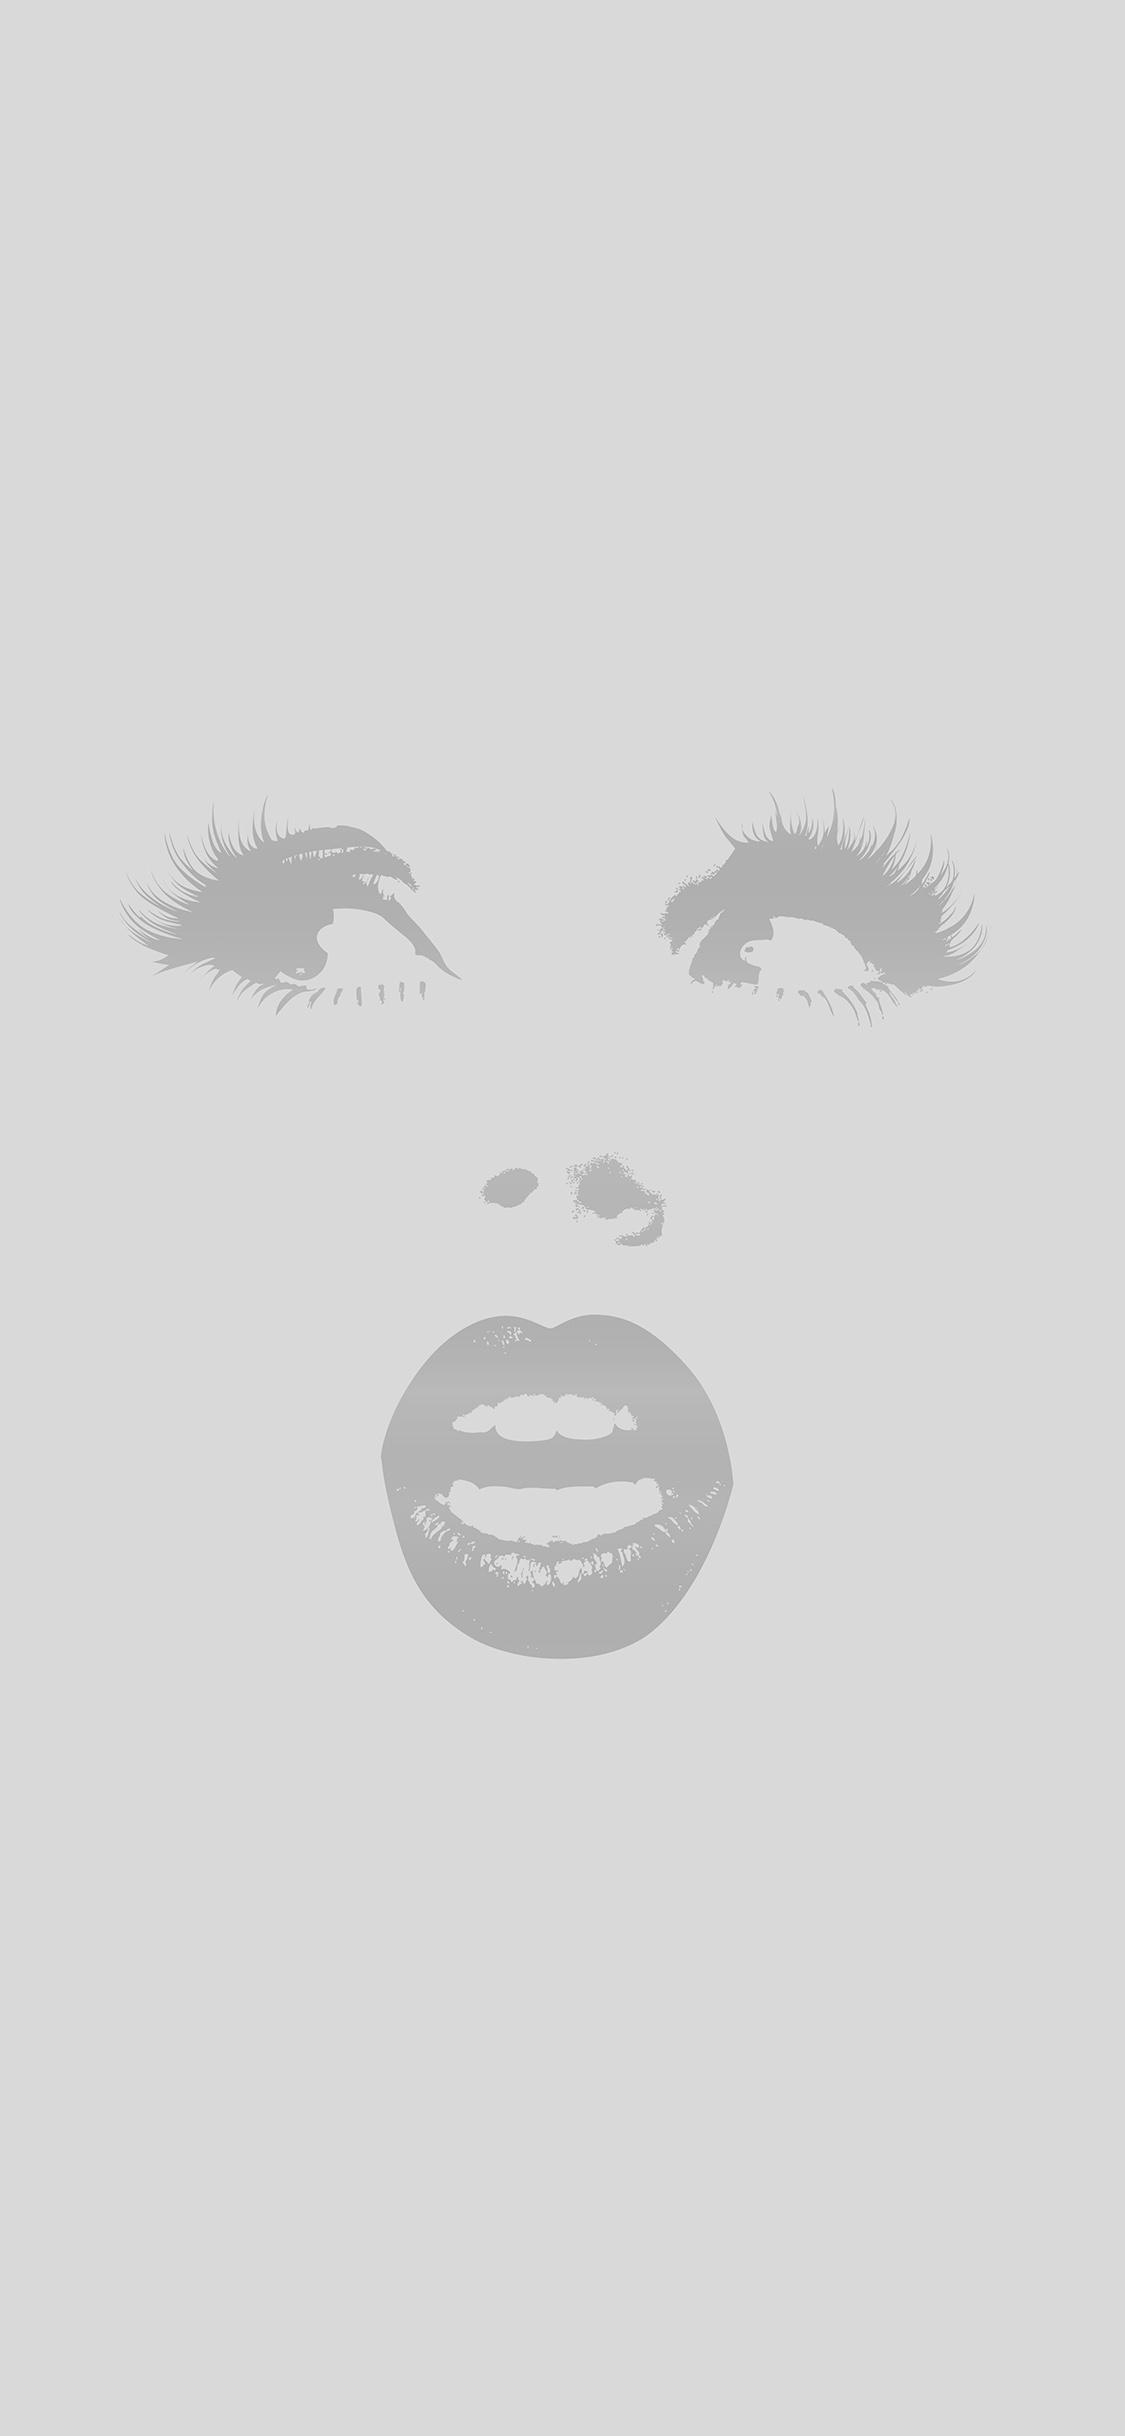 iPhonexpapers.com-Apple-iPhone-wallpaper-al22-surprise-girl-illust-art-simple-minimal-gray